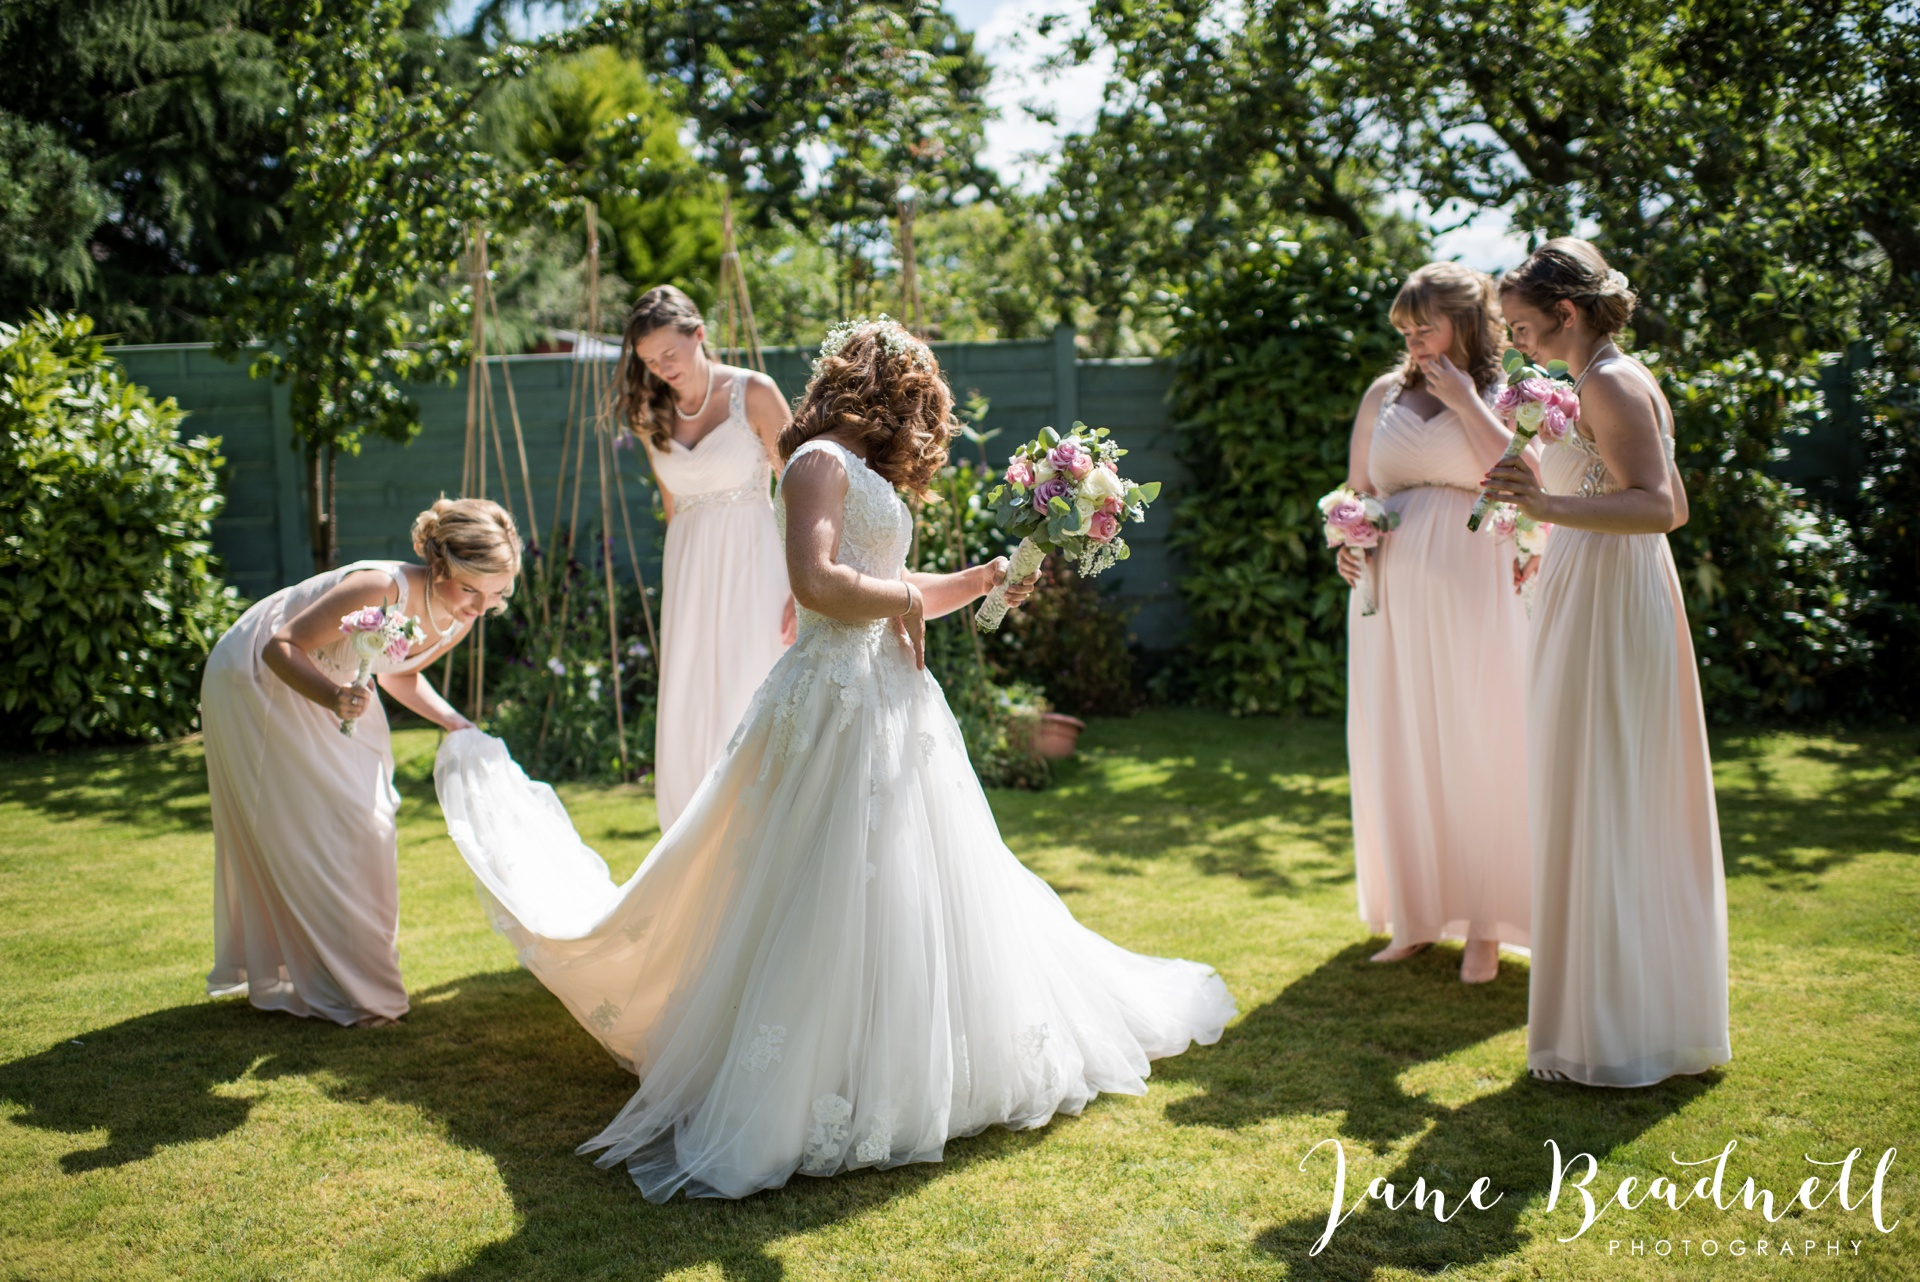 yorkshire-fine-art-wedding-photographer-jane-beadnell-photography-poppleton-york_0014